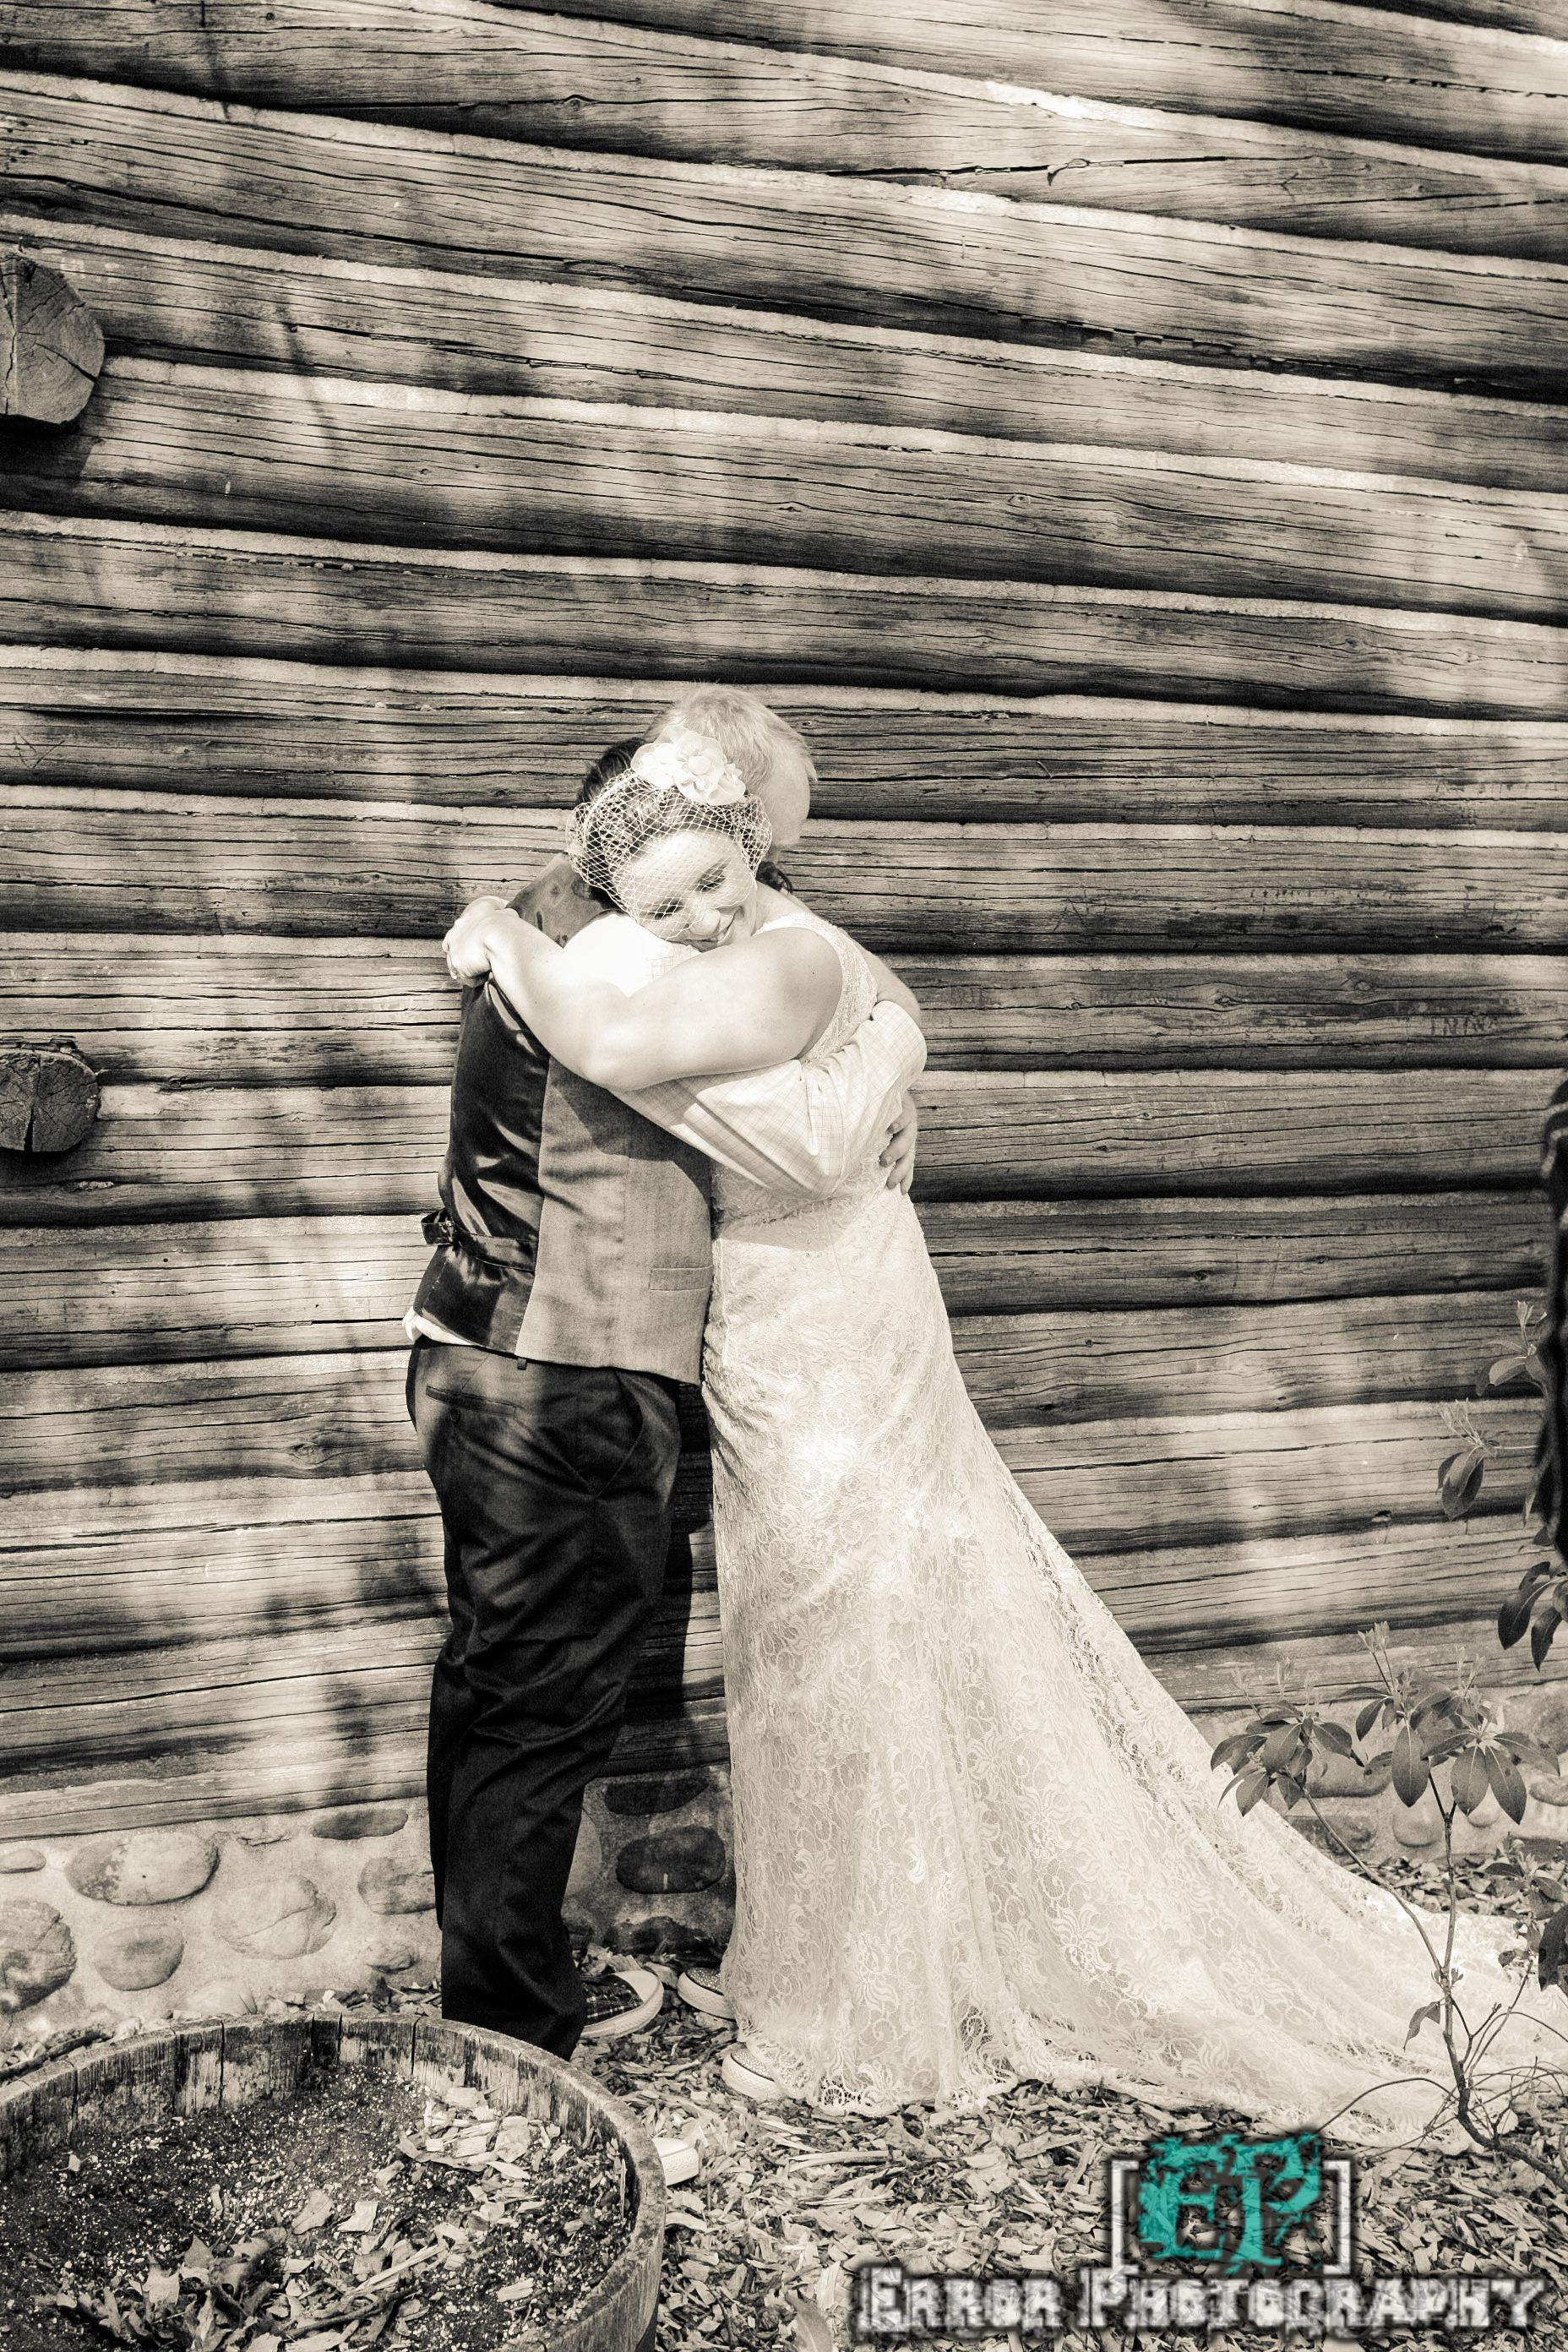 Wedding photos 5-4-13 Error Photography wm-42.jpg